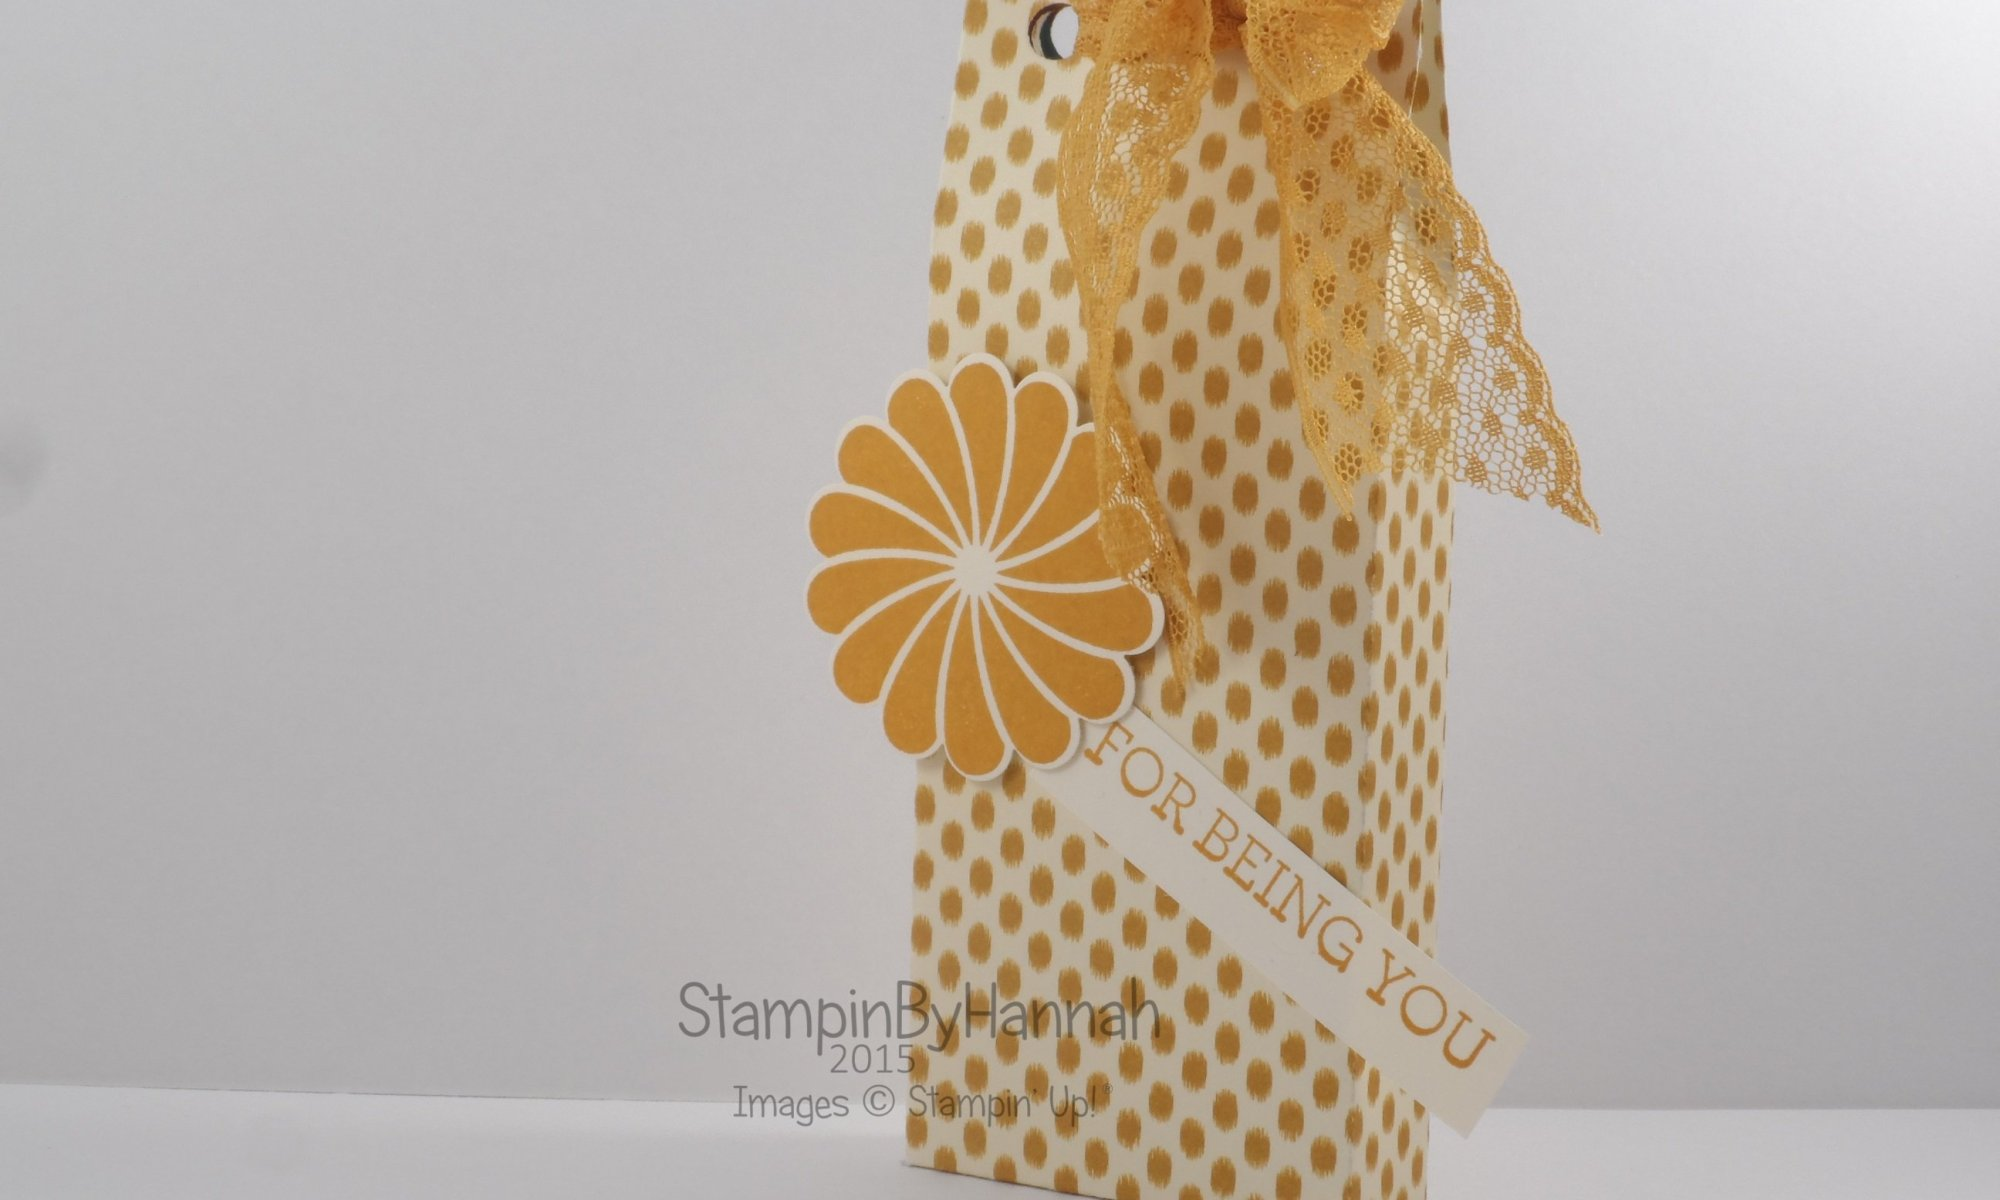 Stampin' Up! UK chocolate gift bag